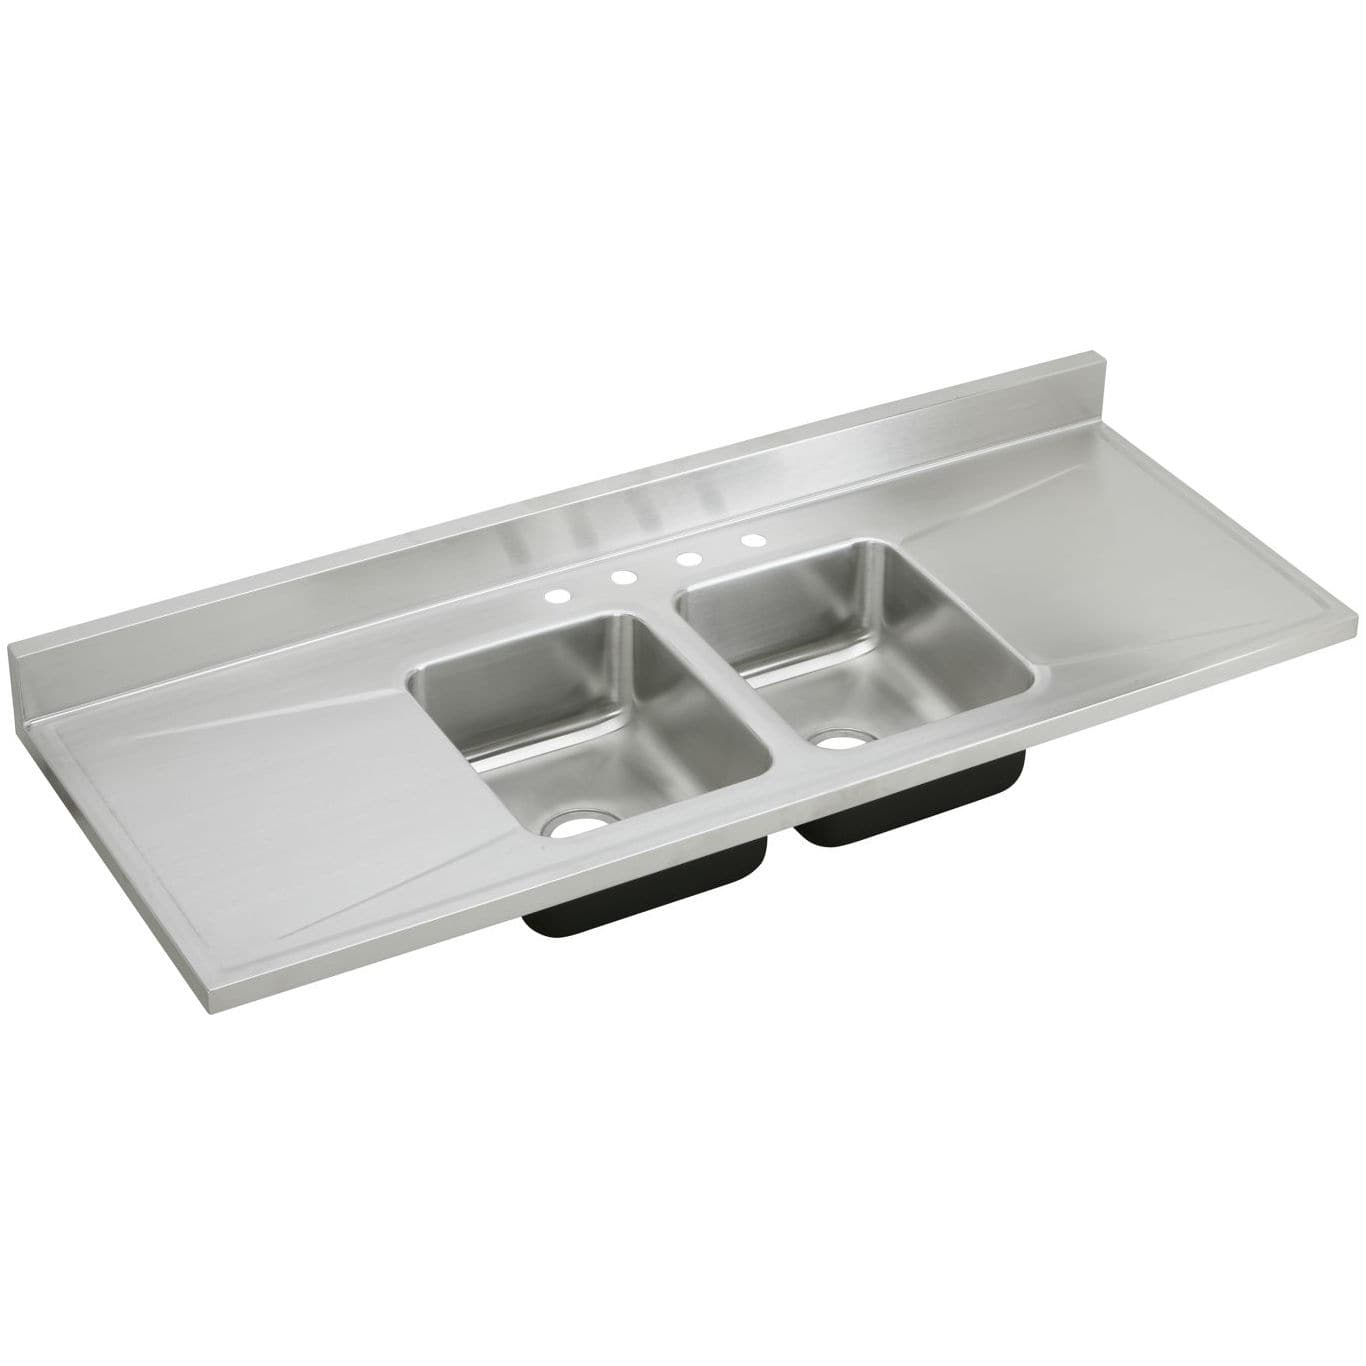 elkay kitchen sinks shop for appliances 双槽厨房水槽 不锈钢 商用